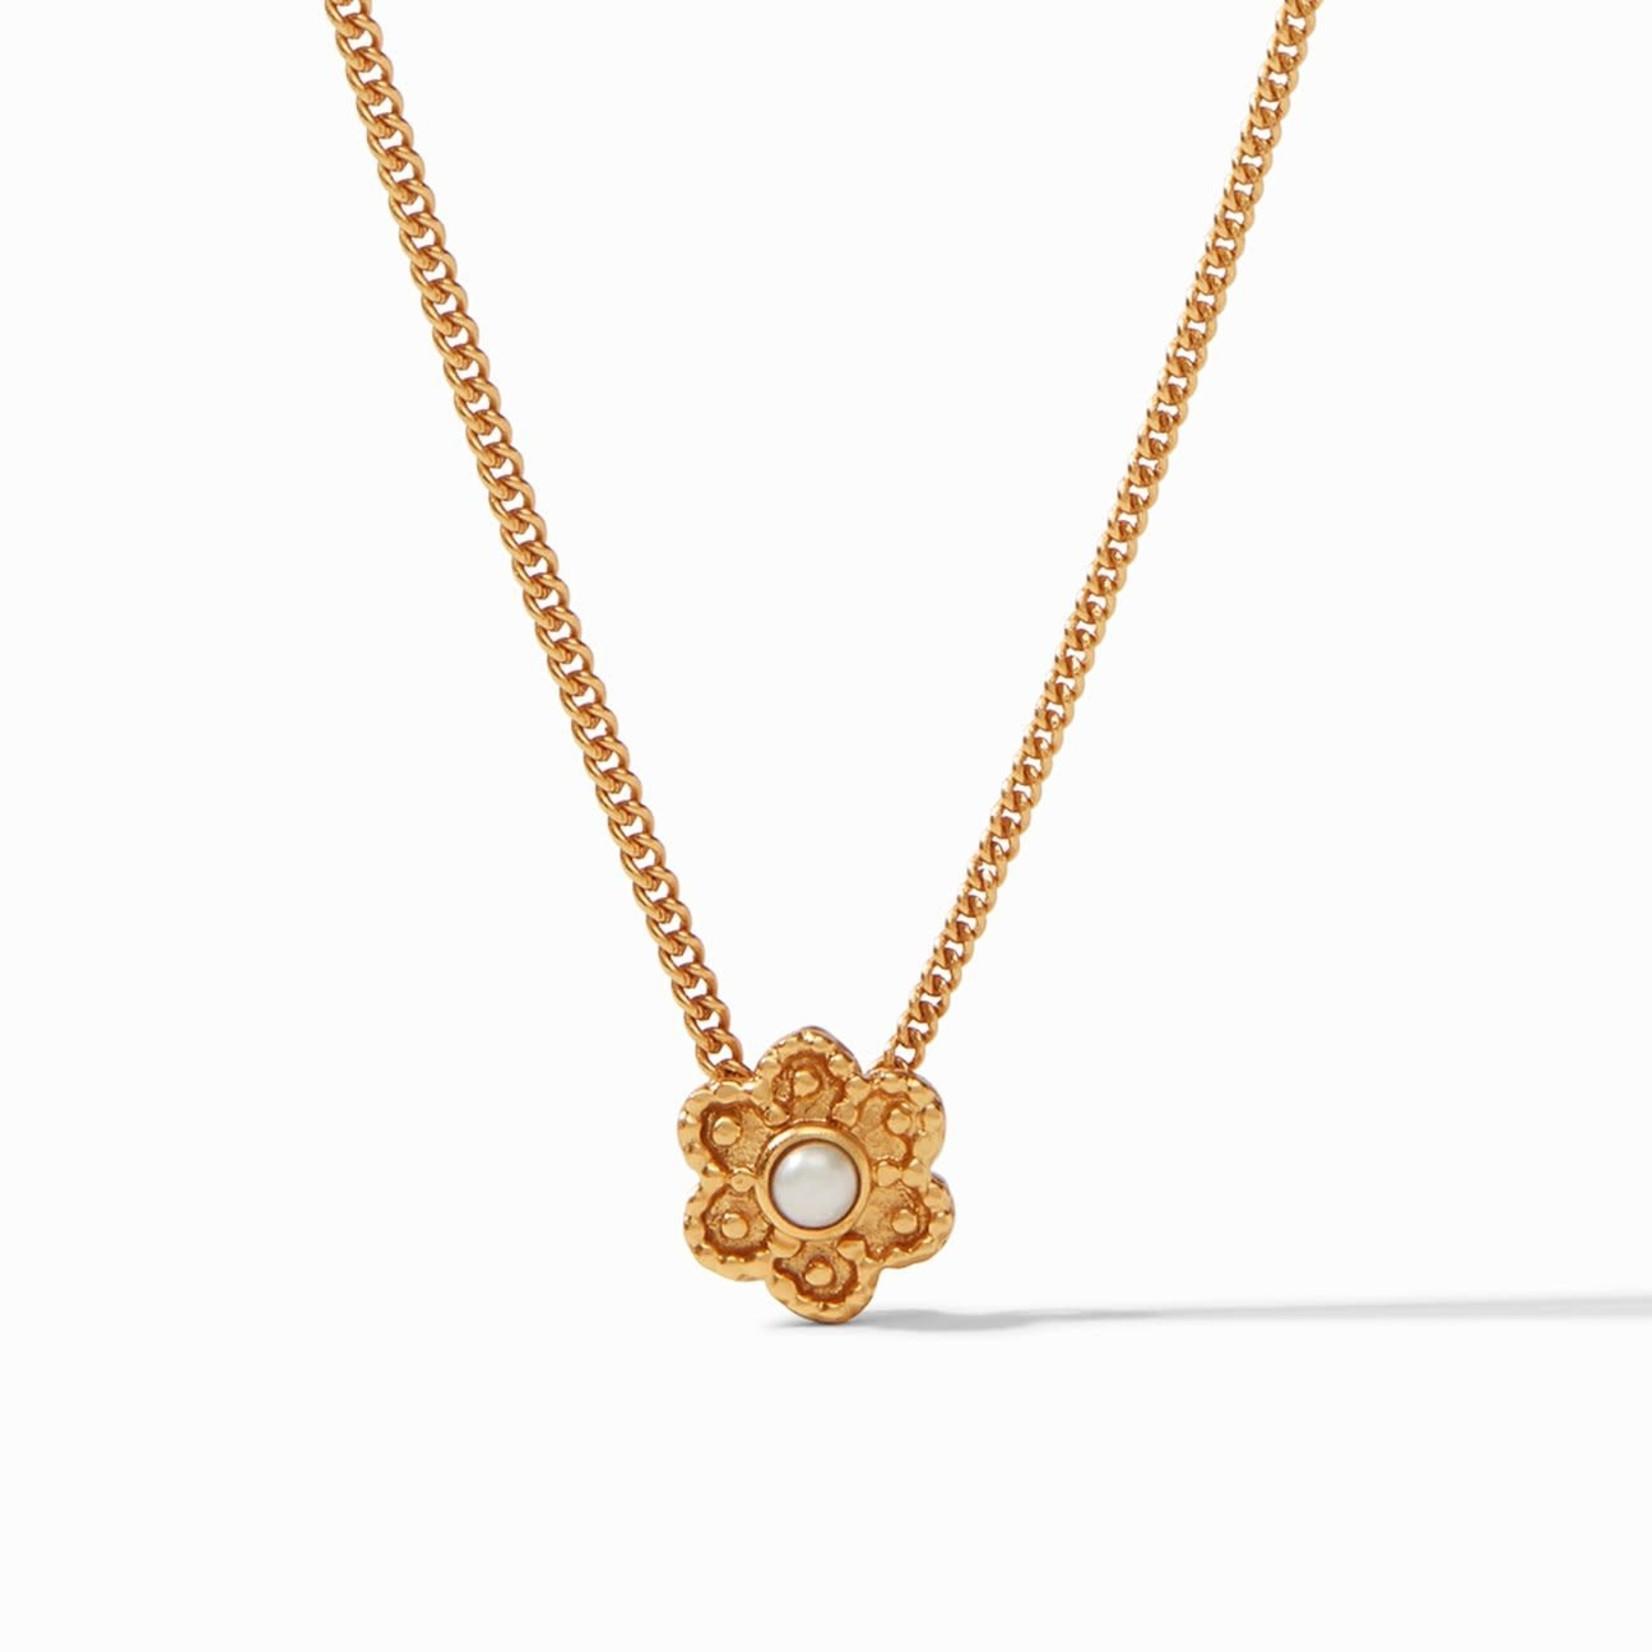 Julie Vos Colette Delicate Flower Necklace - Pearl